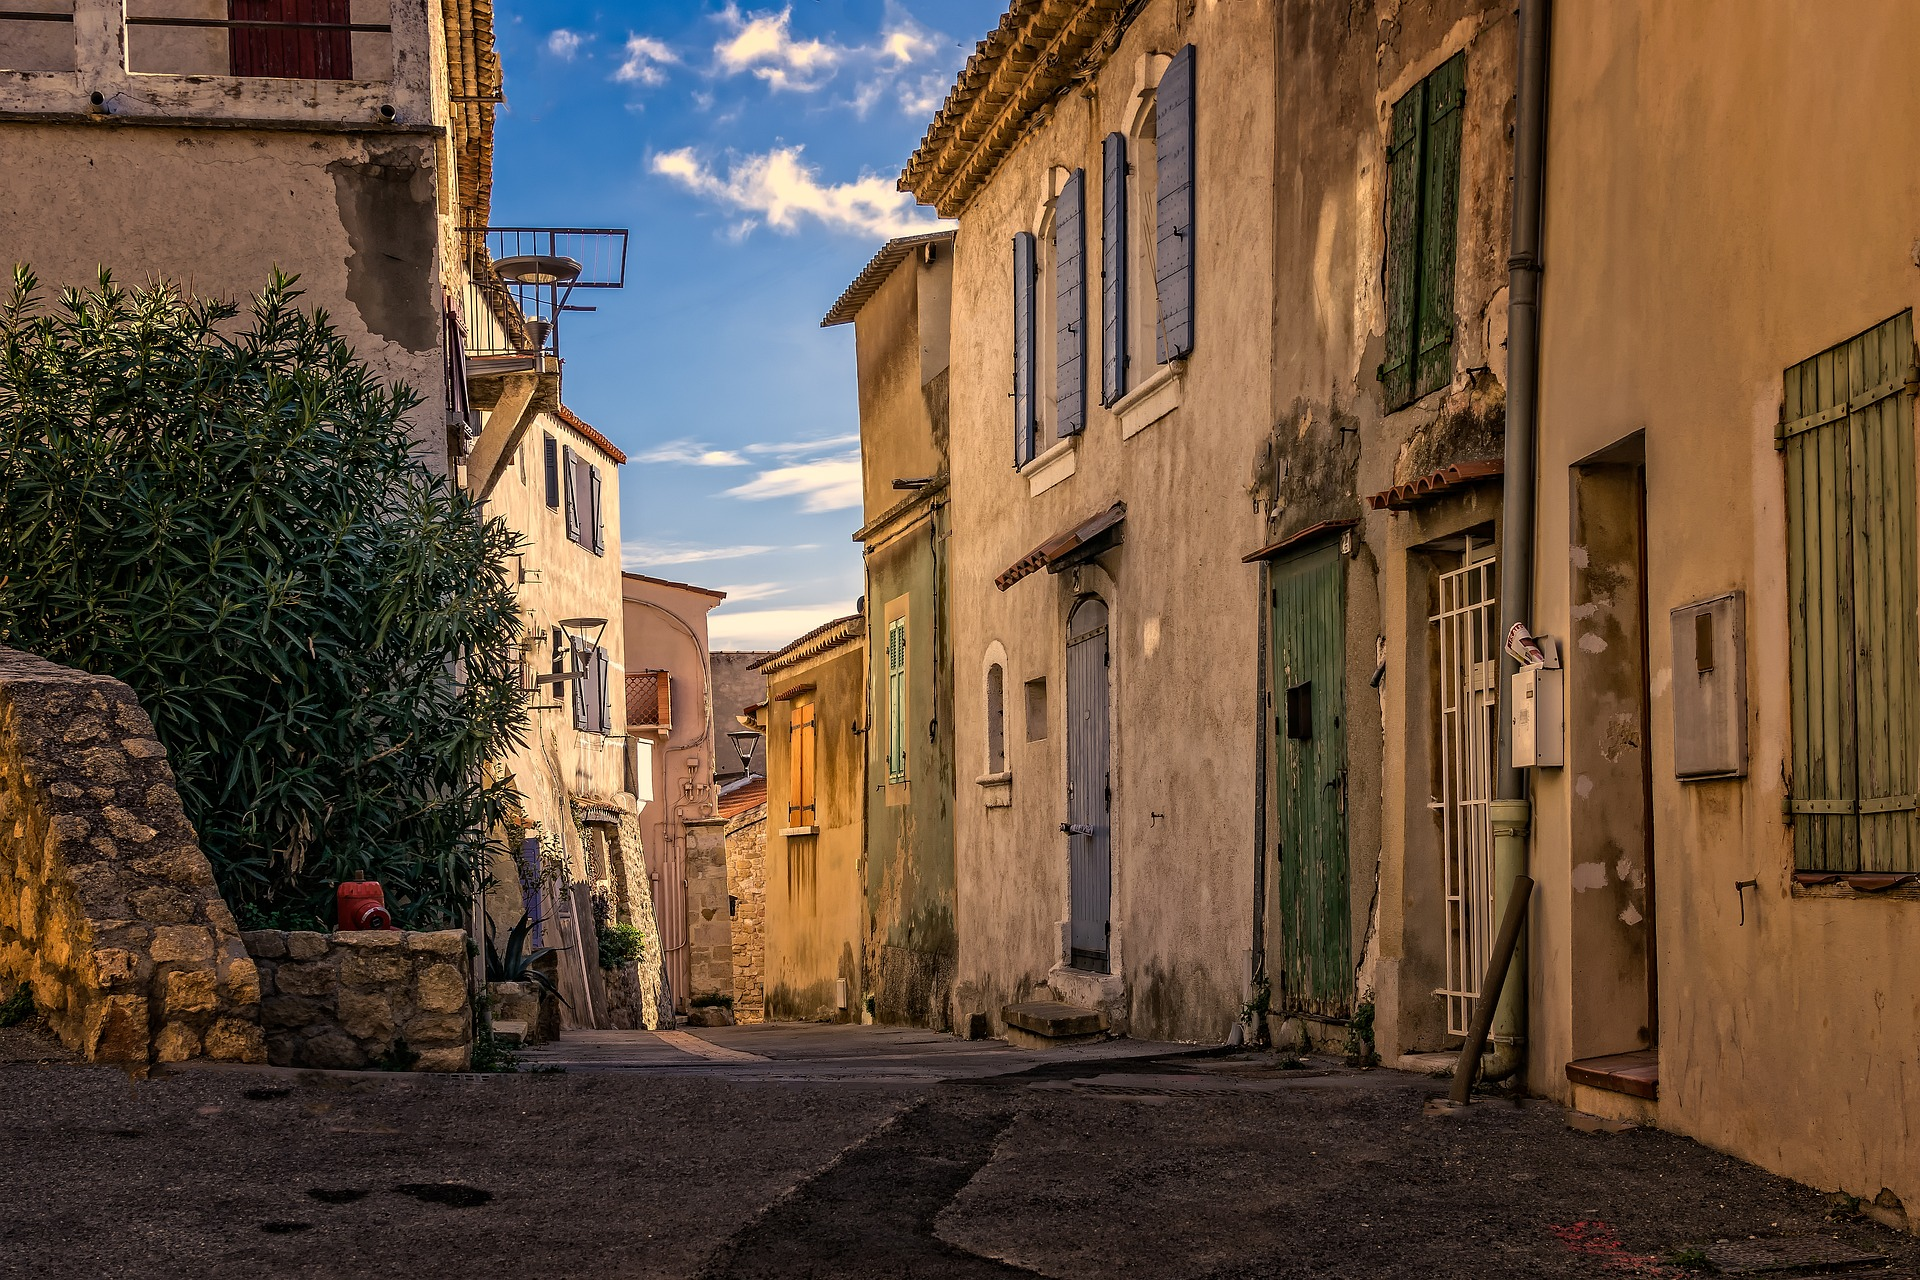 hedera bauwert: Denkmalsanierung als Chance gegen Wohnungsknappheit